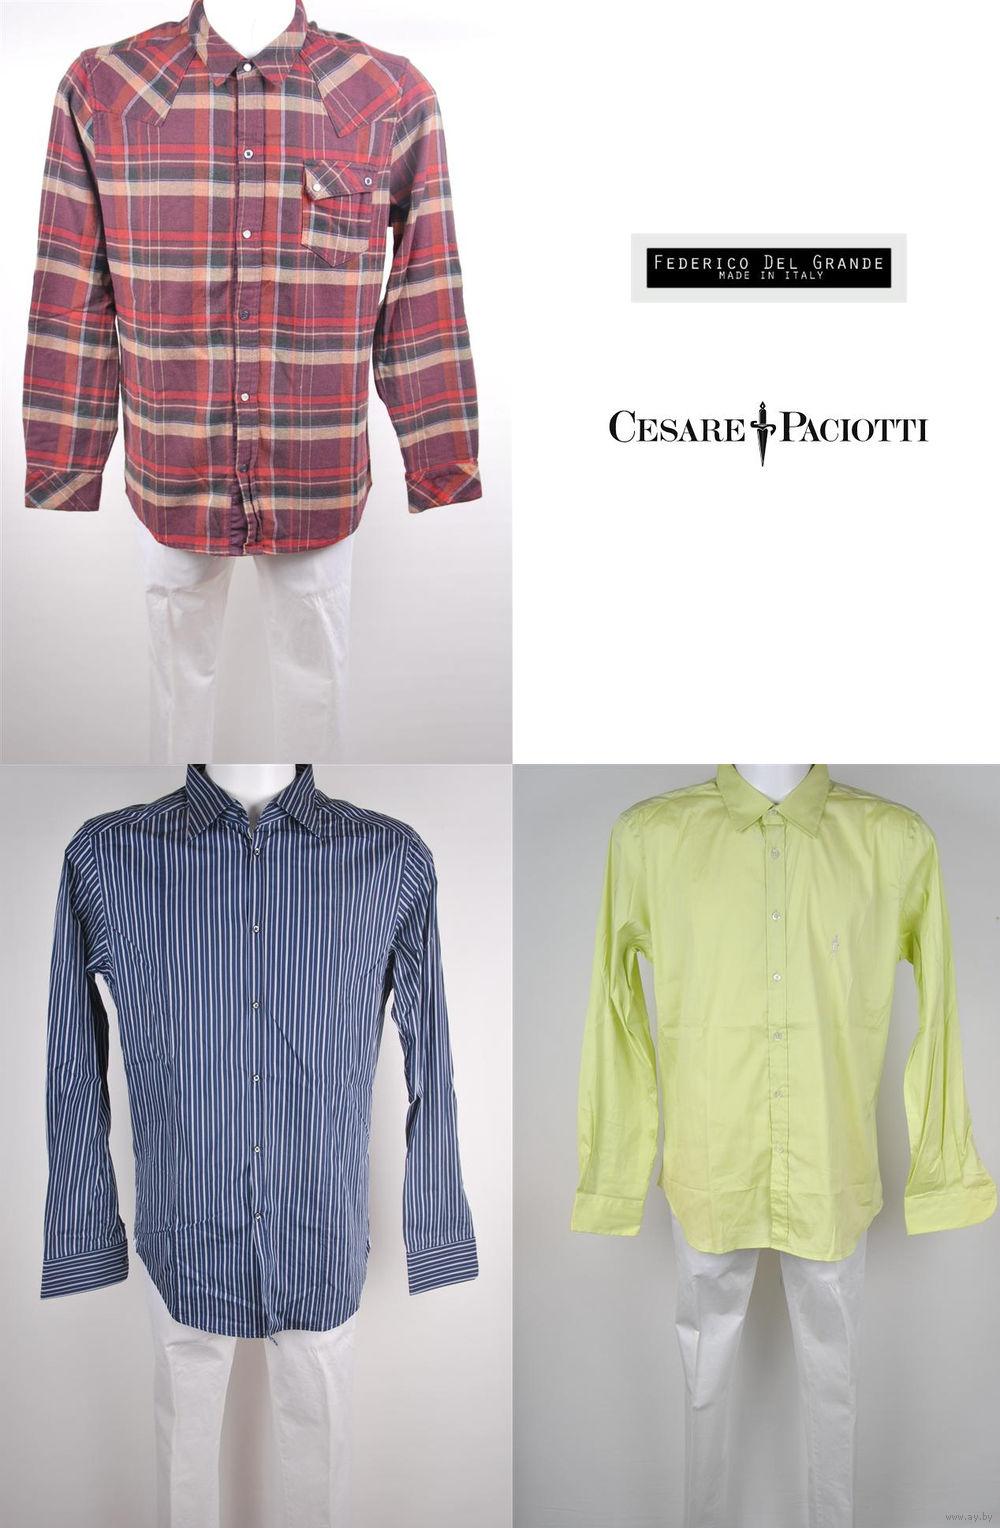 Купить Рубашку В Минске